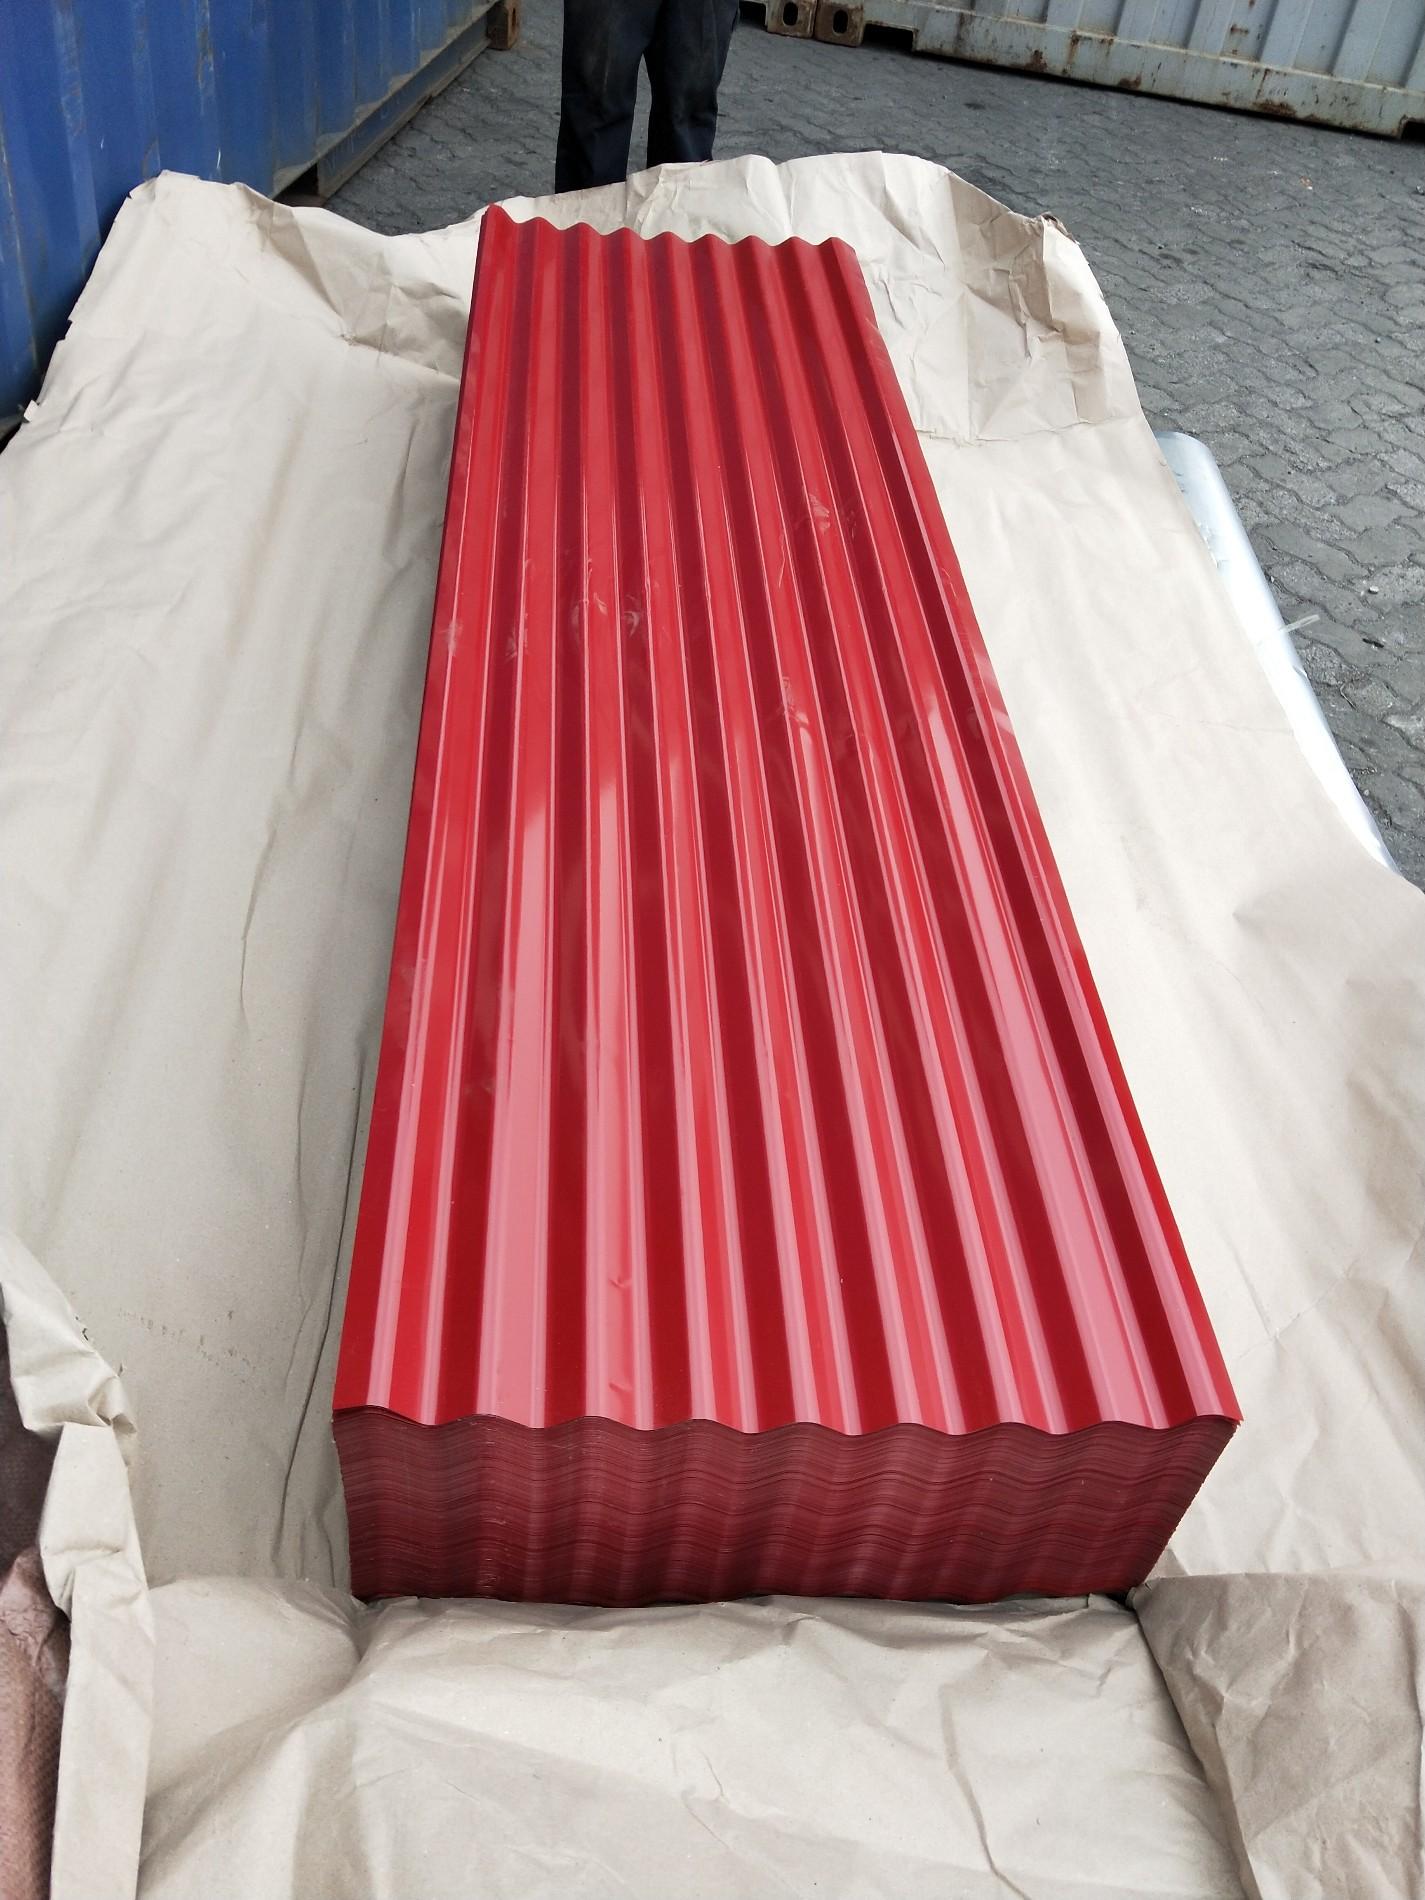 Ppgi Roof Sheets Manufacturers, Ppgi Roof Sheets Factory, Supply Ppgi Roof Sheets